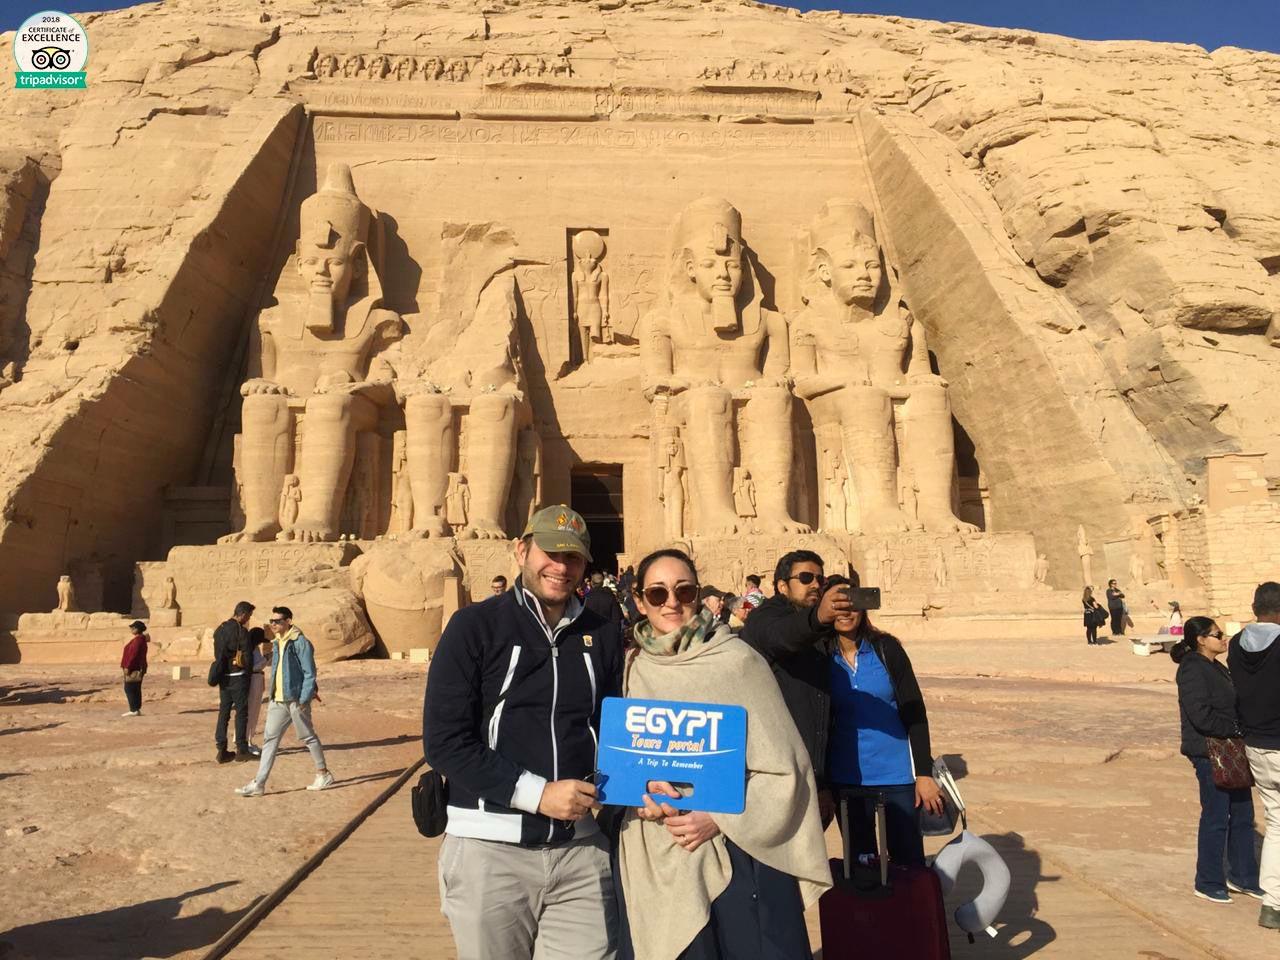 Abu Simbel Temple - Overnight Luxor & Abu Simbel Tours from Hurghada - Egypt Tours Portal